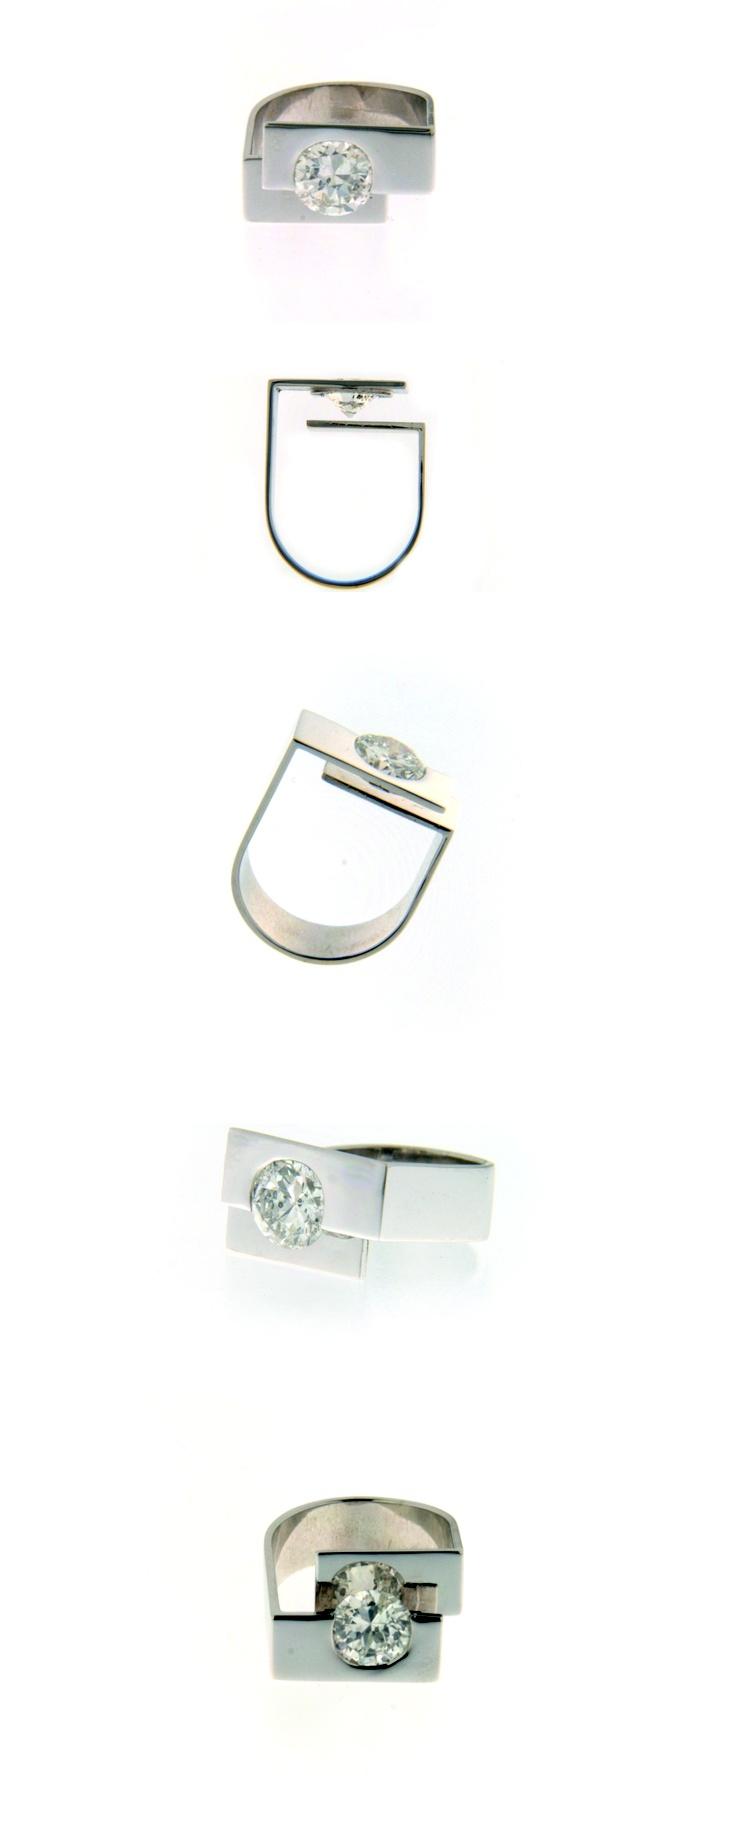 White gold and diamond ring. www.alegriab.com